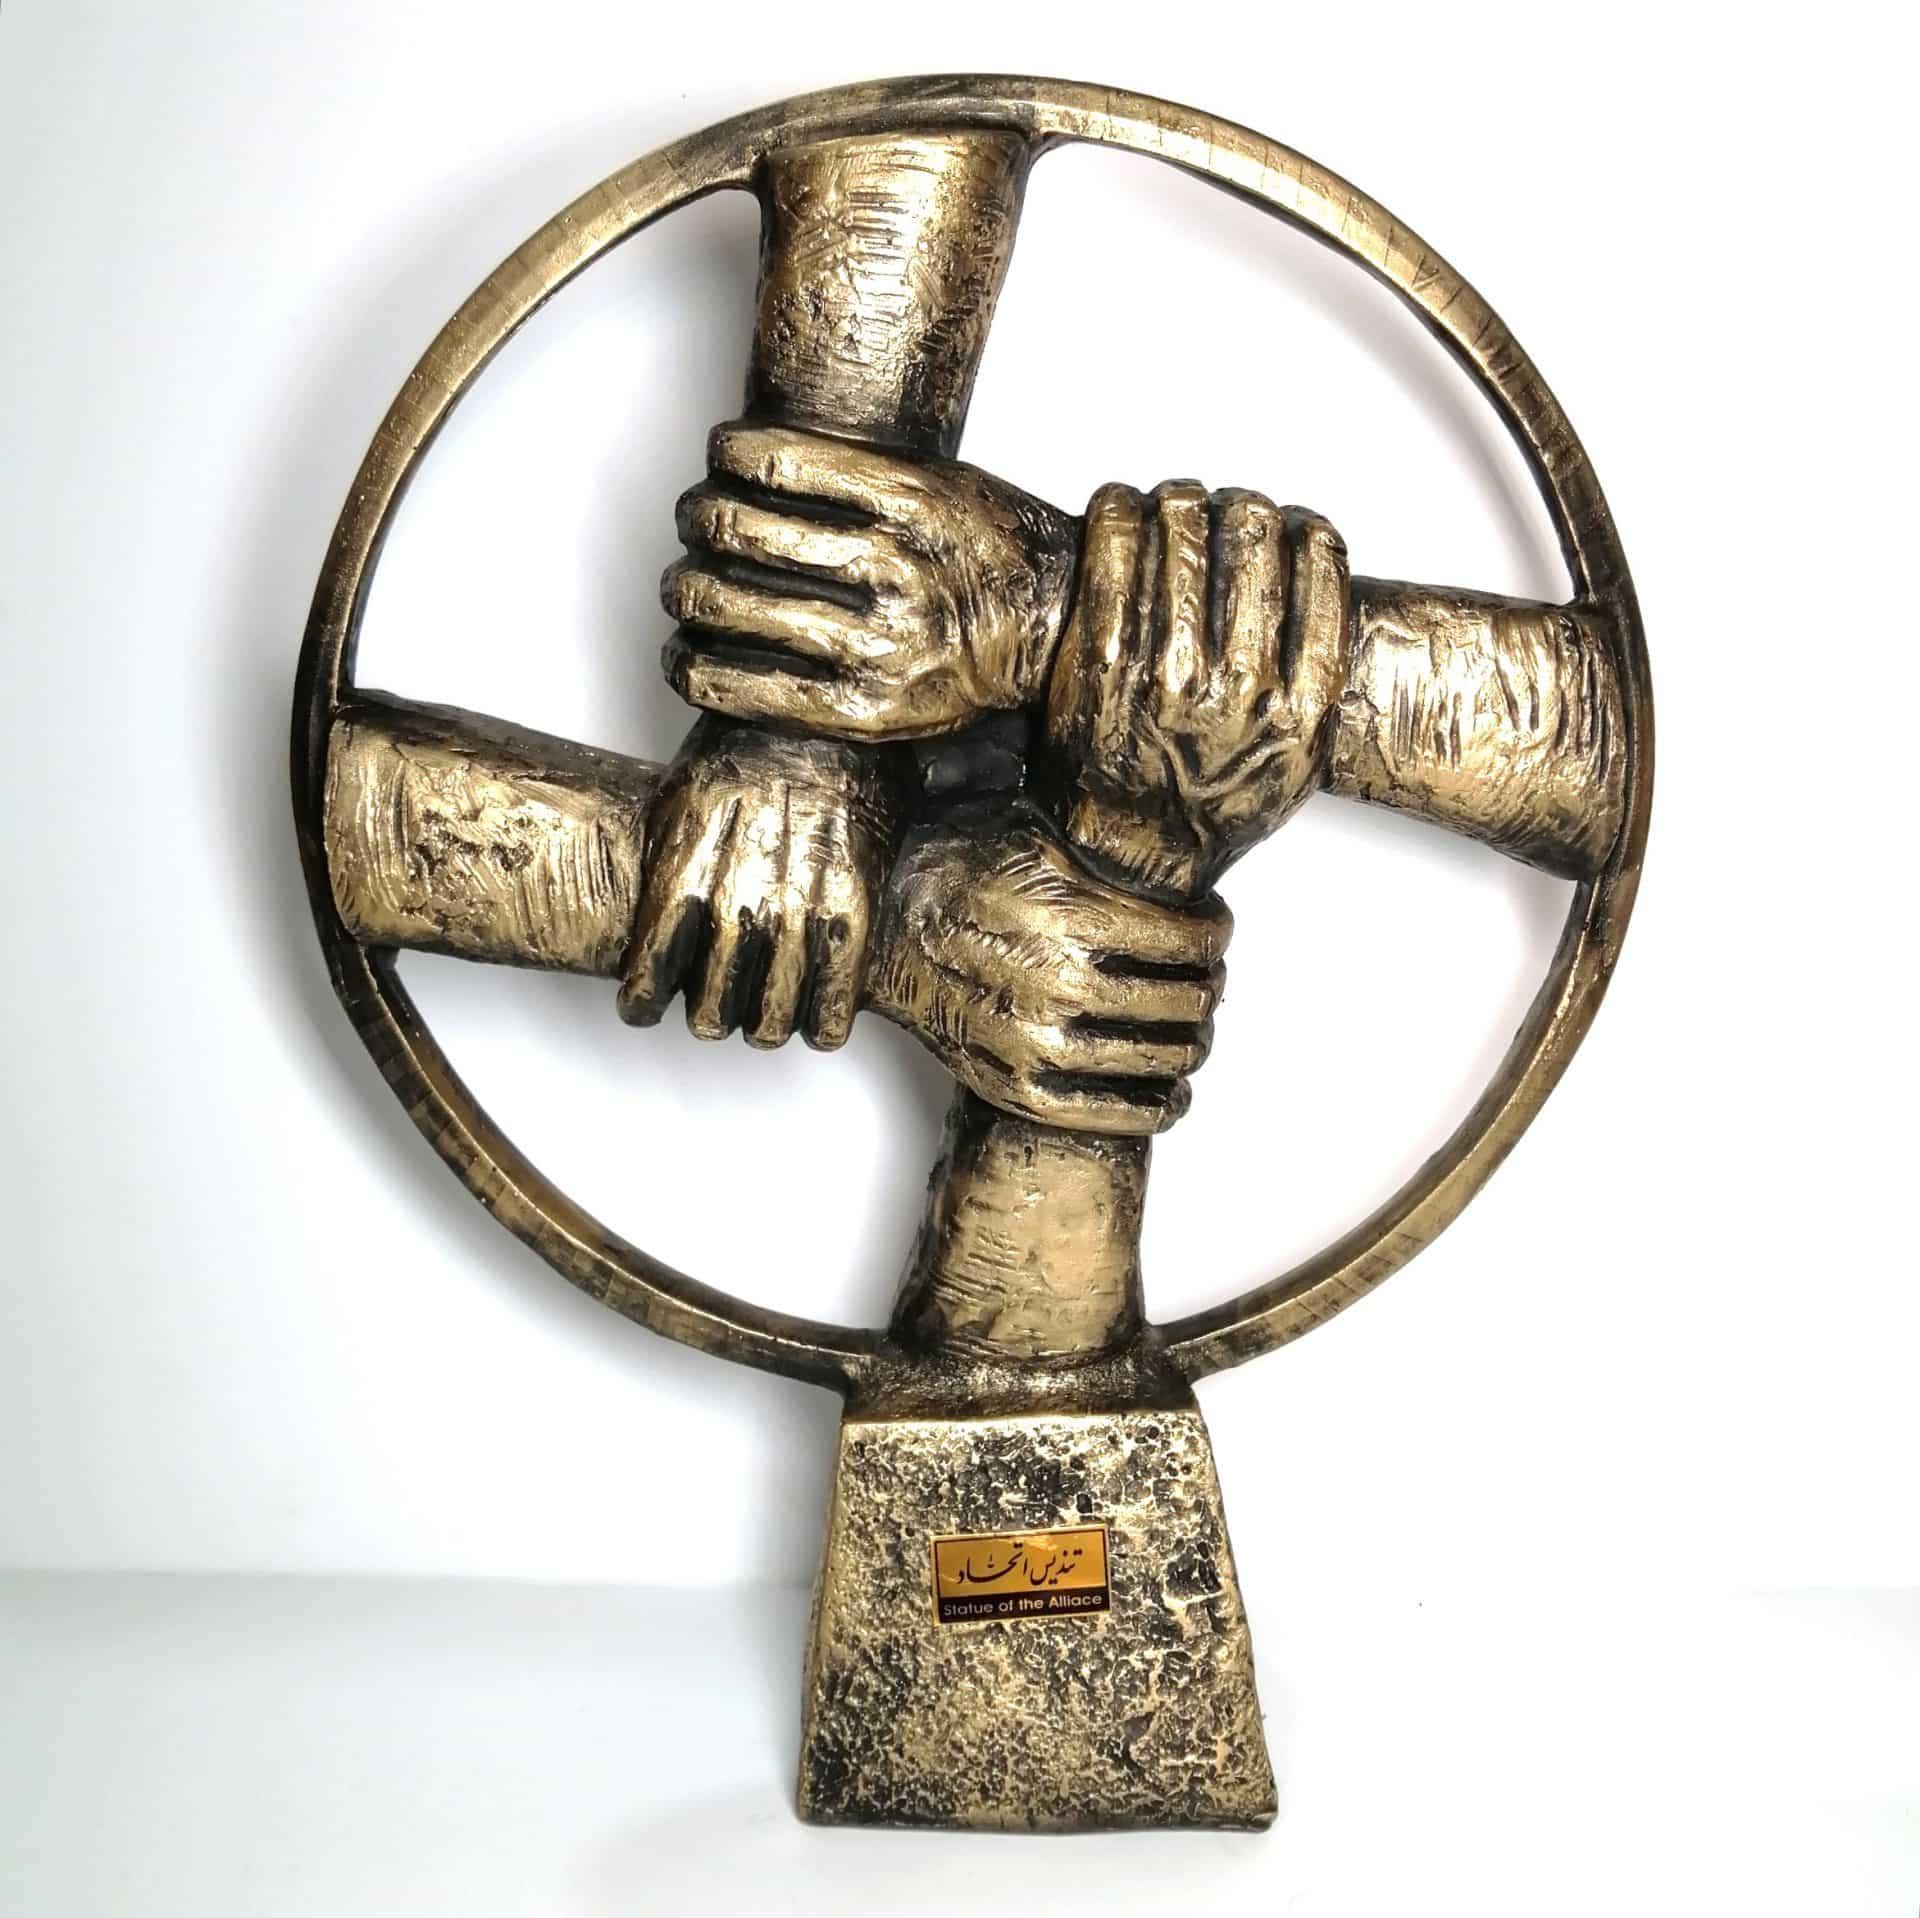 مجسمه تندیس اتحاد